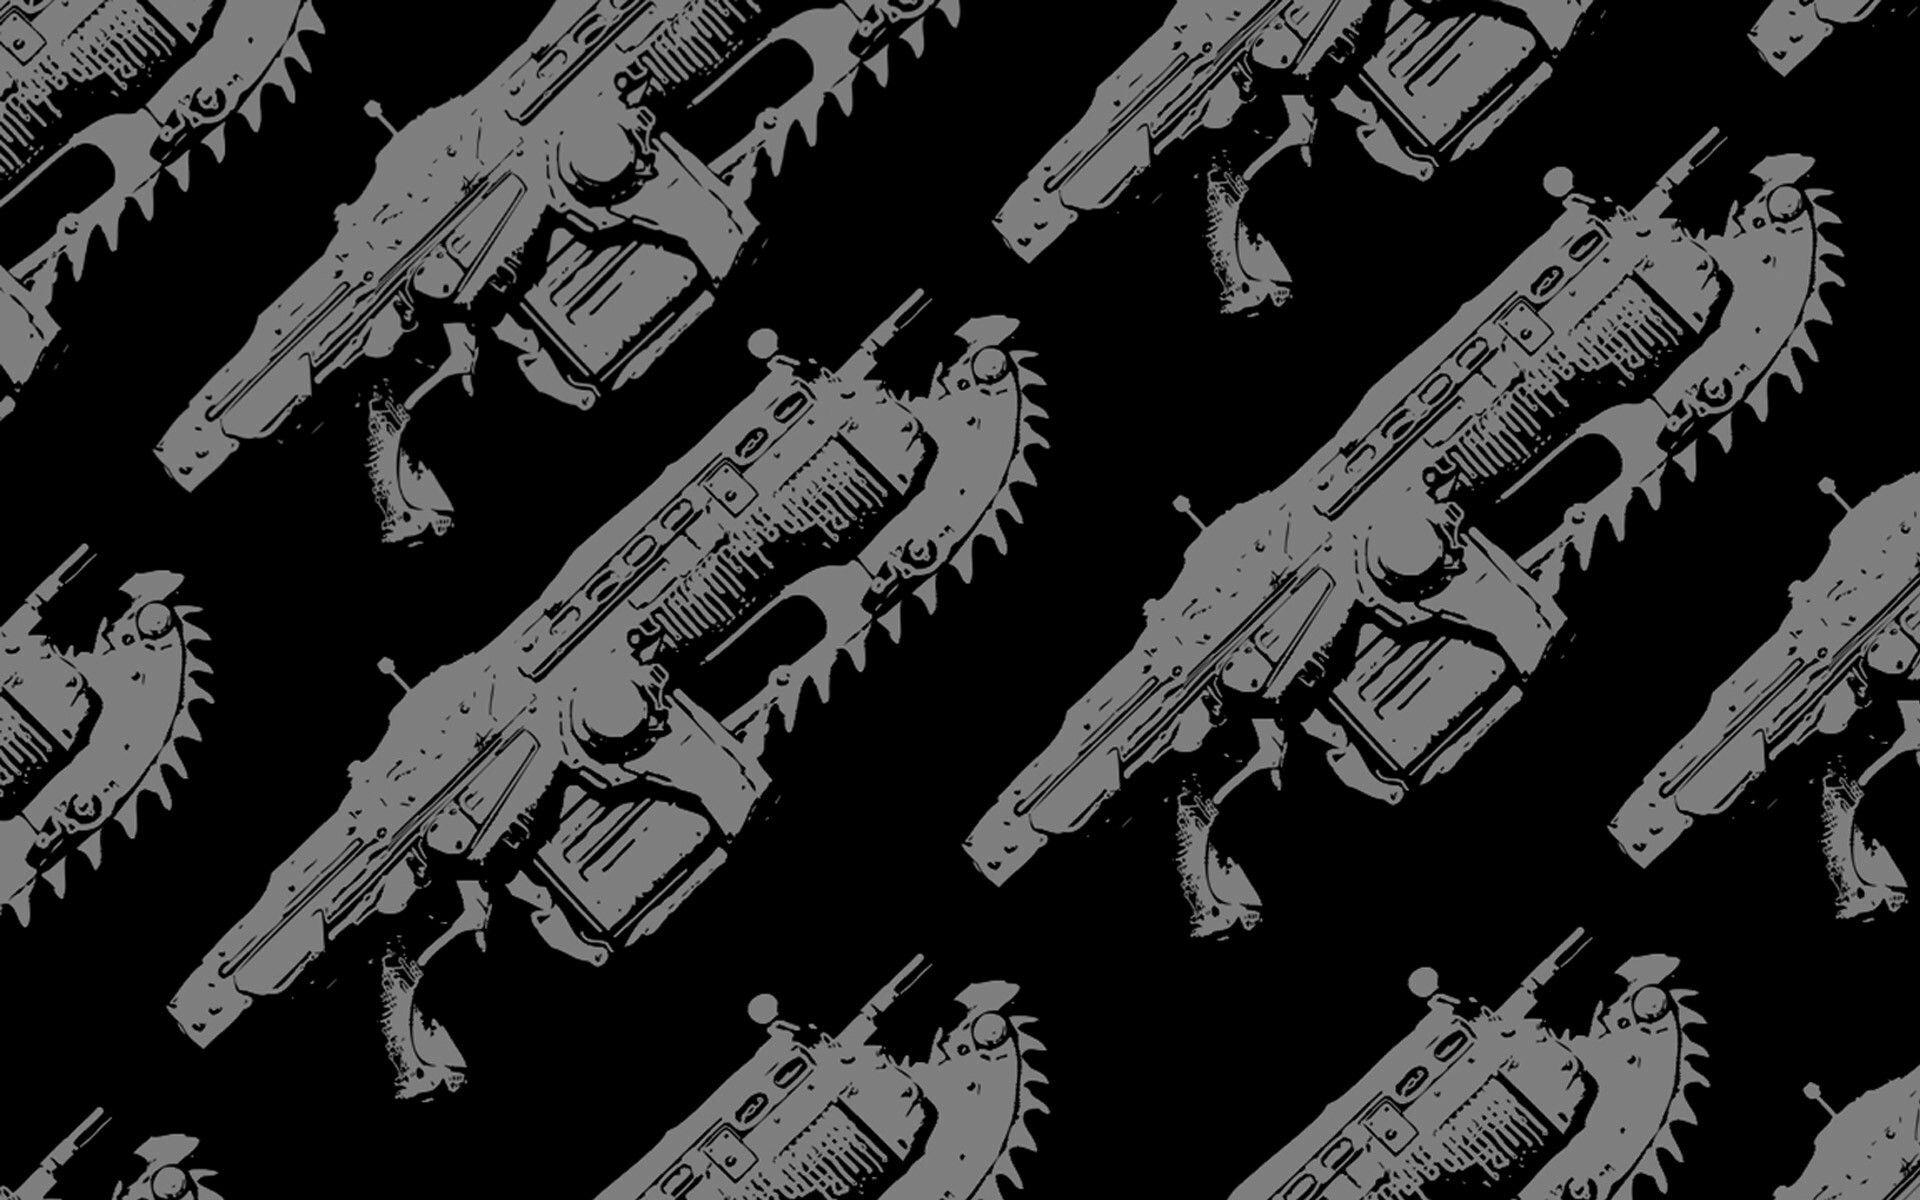 Game Wallpaper Gears Of War Immagini Video